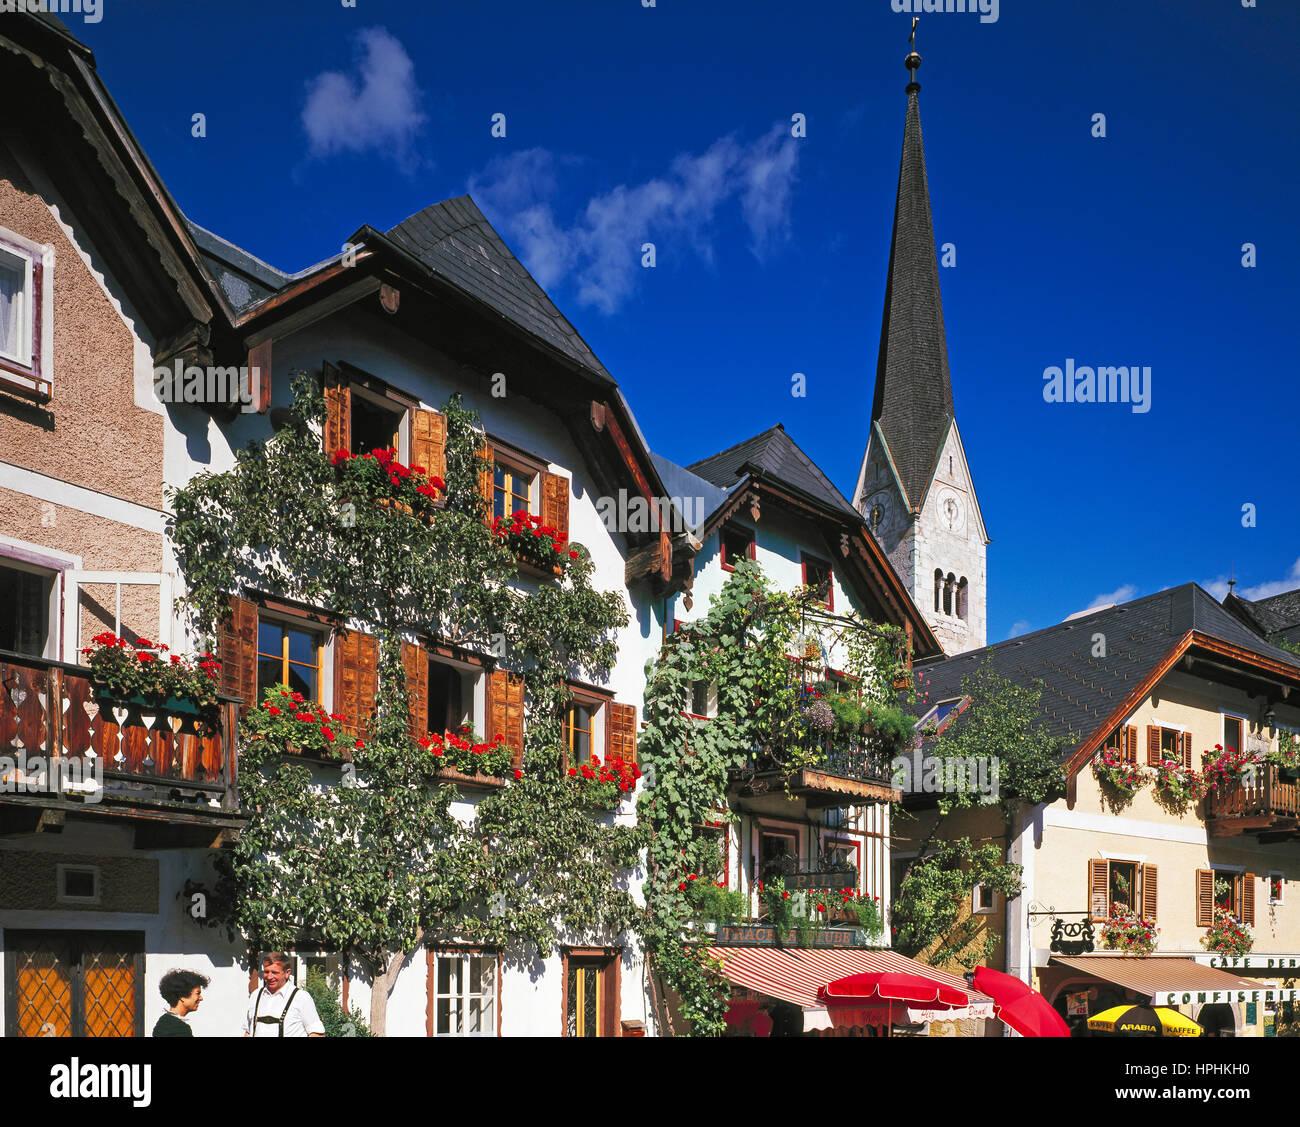 Market Square, Hallstatt, Tirol, Austria - Stock Image